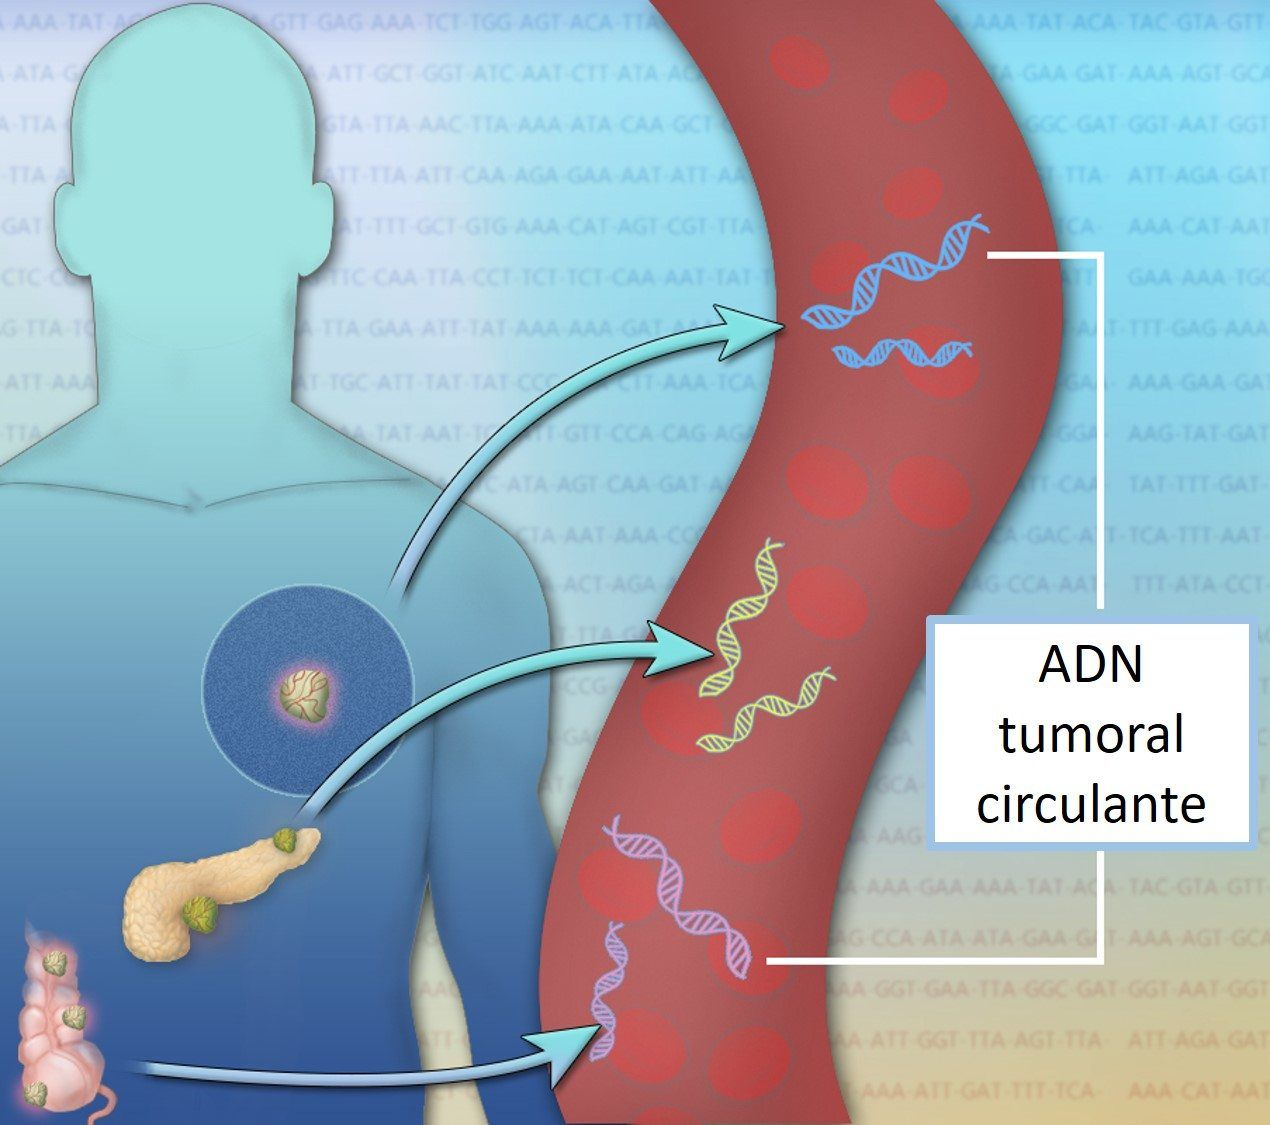 biopsias líquidas cáncer